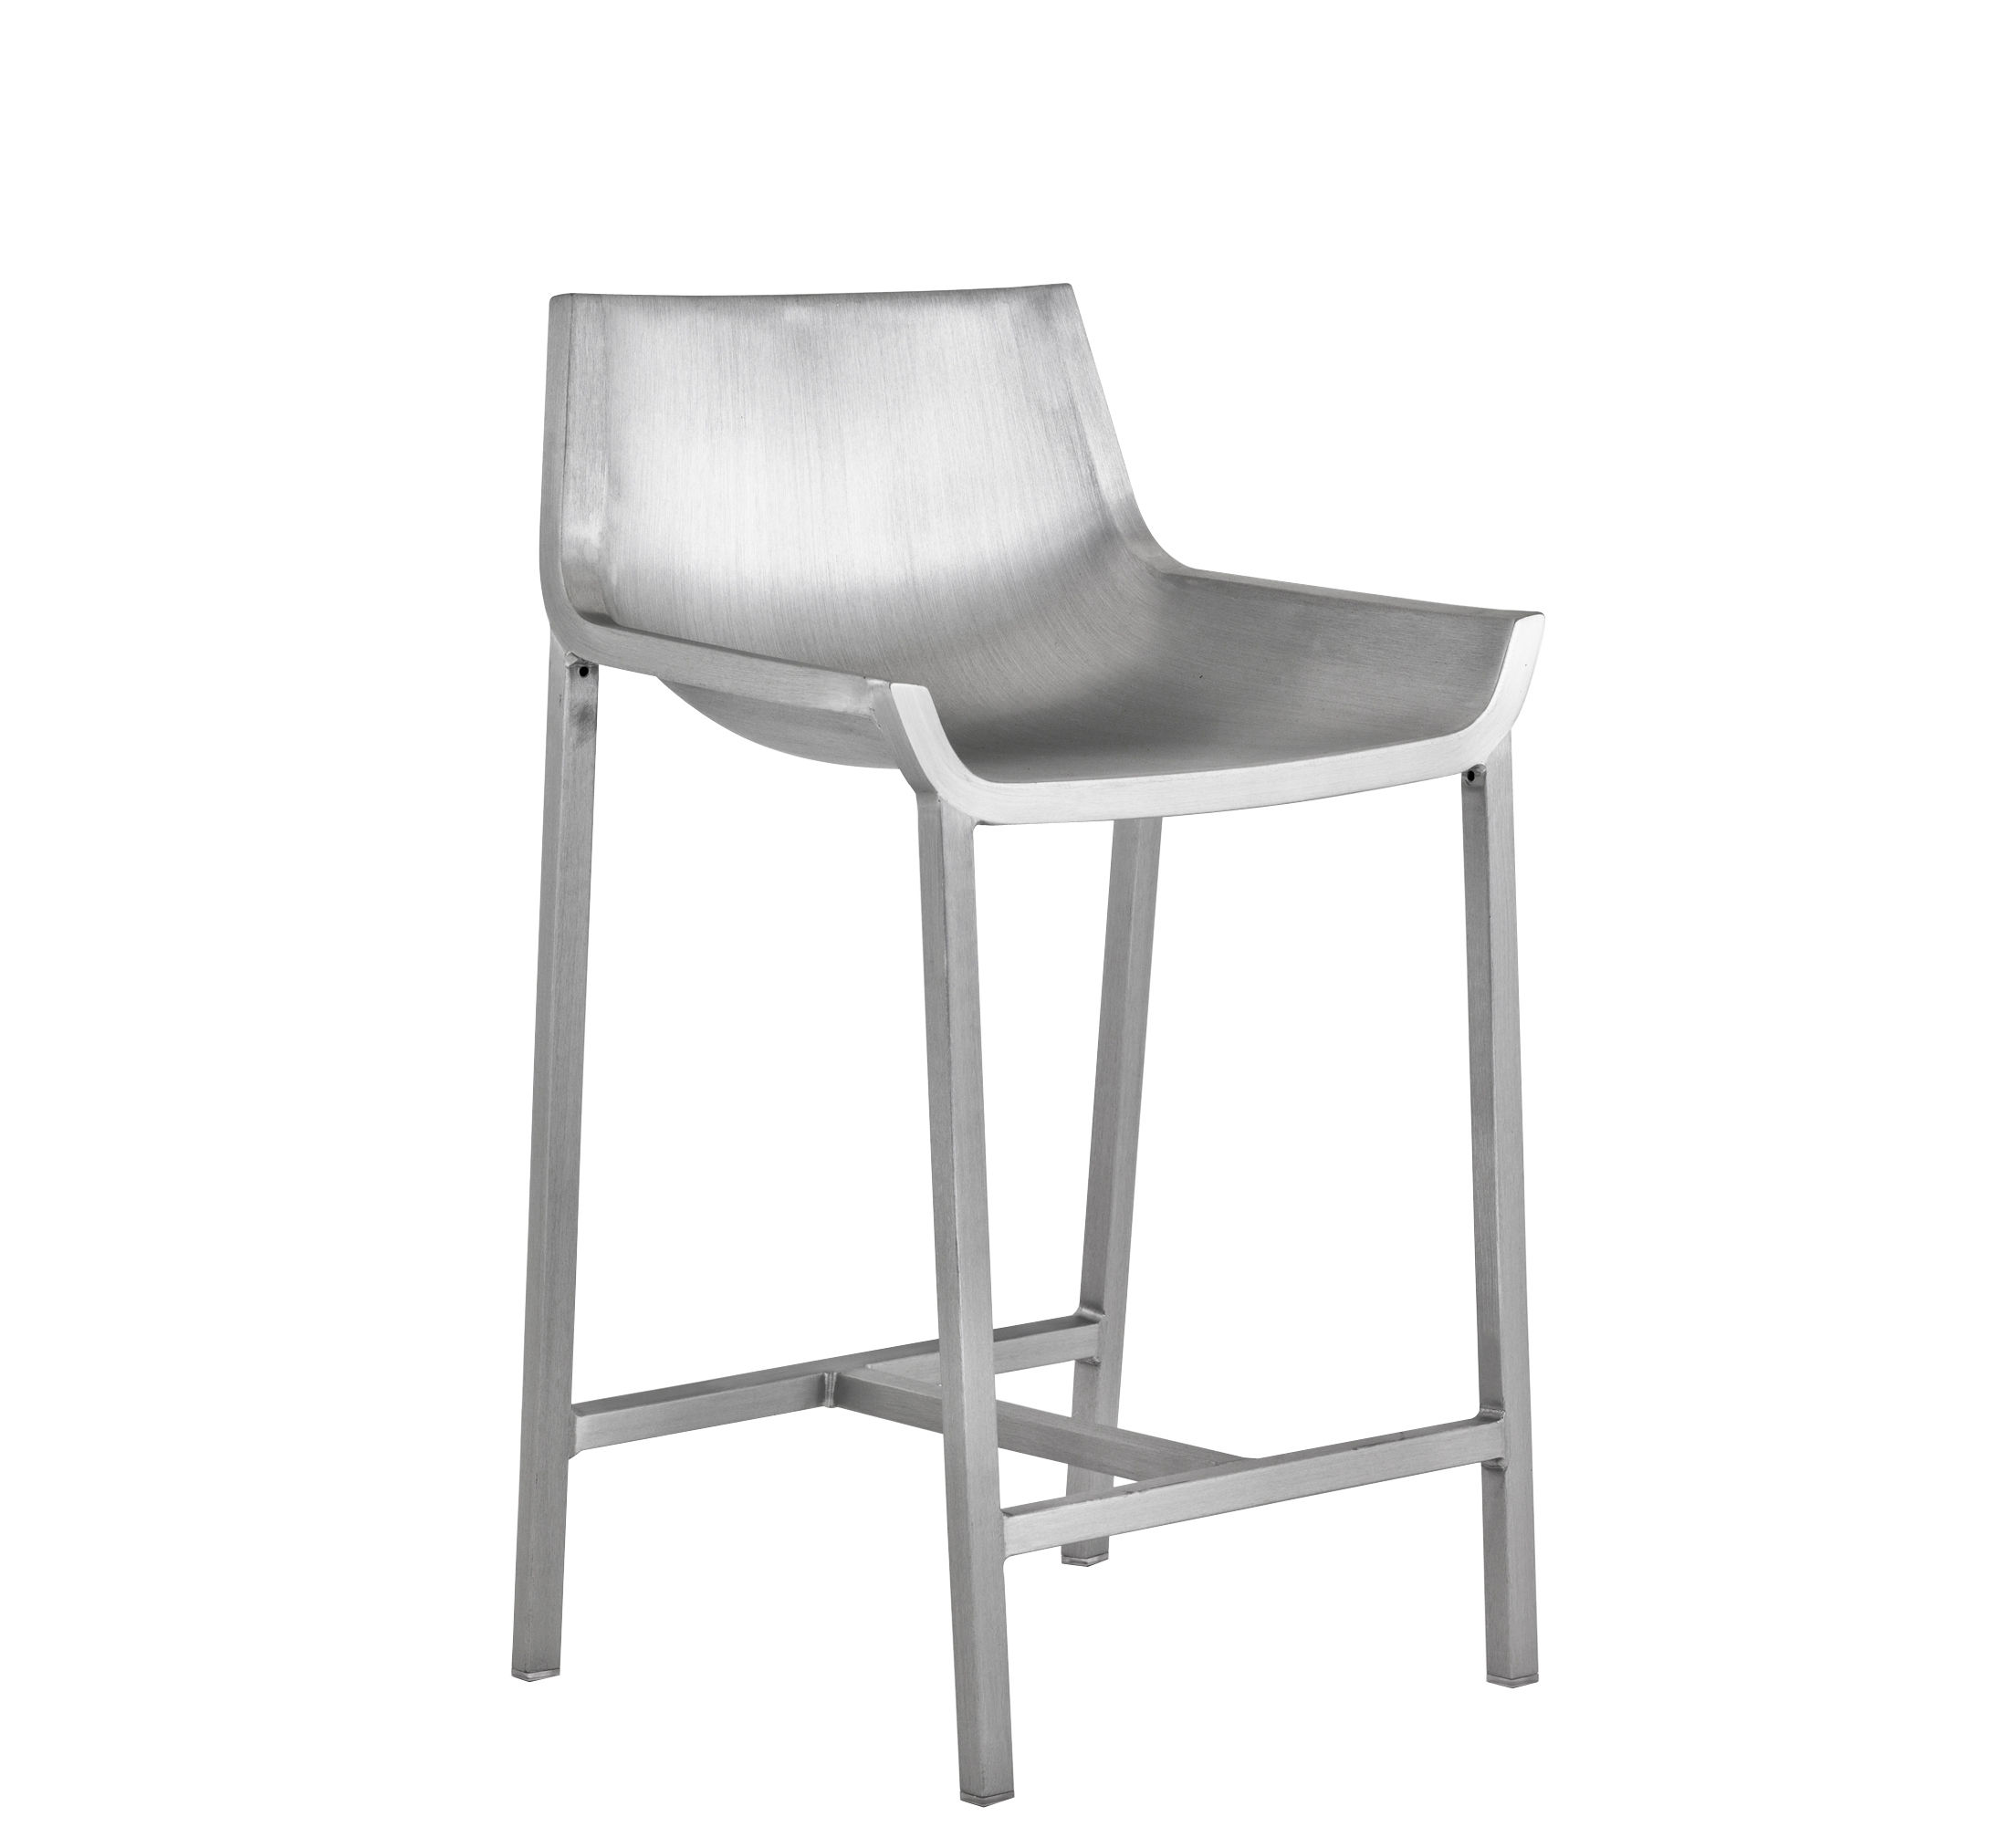 Furniture - Bar Stools - Sezz Bar chair - H 61 cm - Aluminium by Emeco - Brushed aluminium - Brushed aluminium